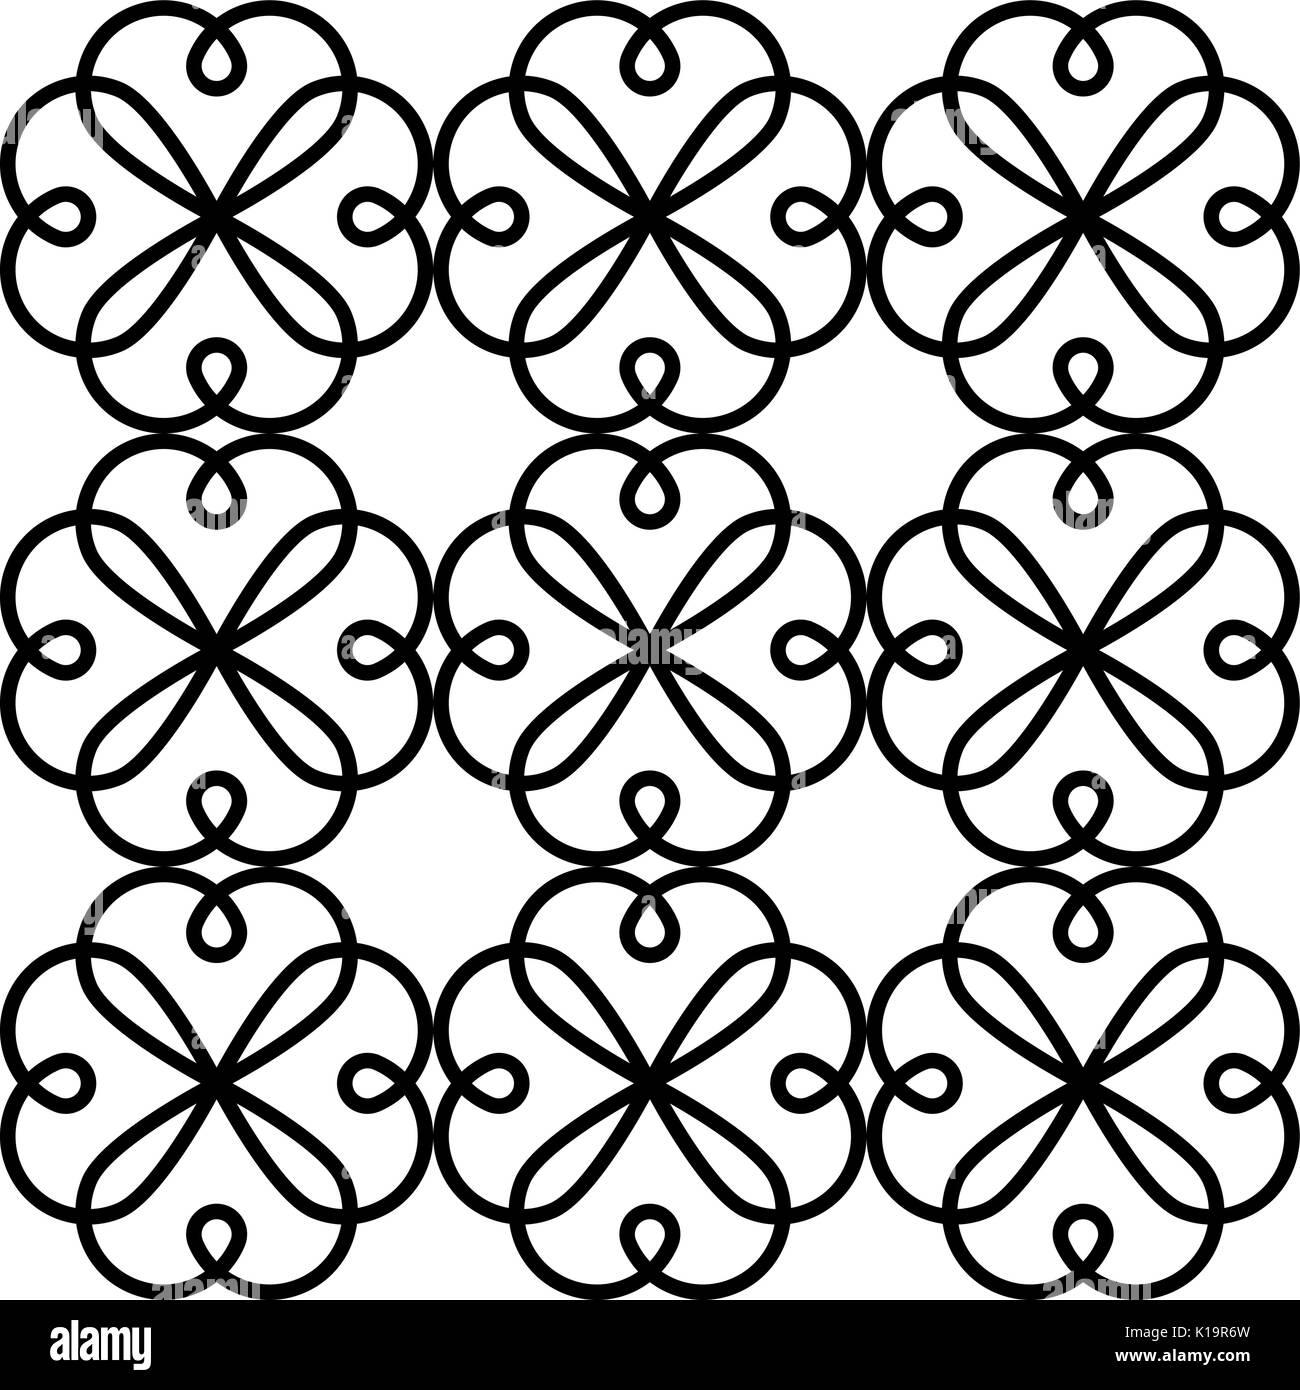 Geometric vector tile design, Portuguese or Spanish seamless black and white tiles, Azulejos pattern - Stock Vector